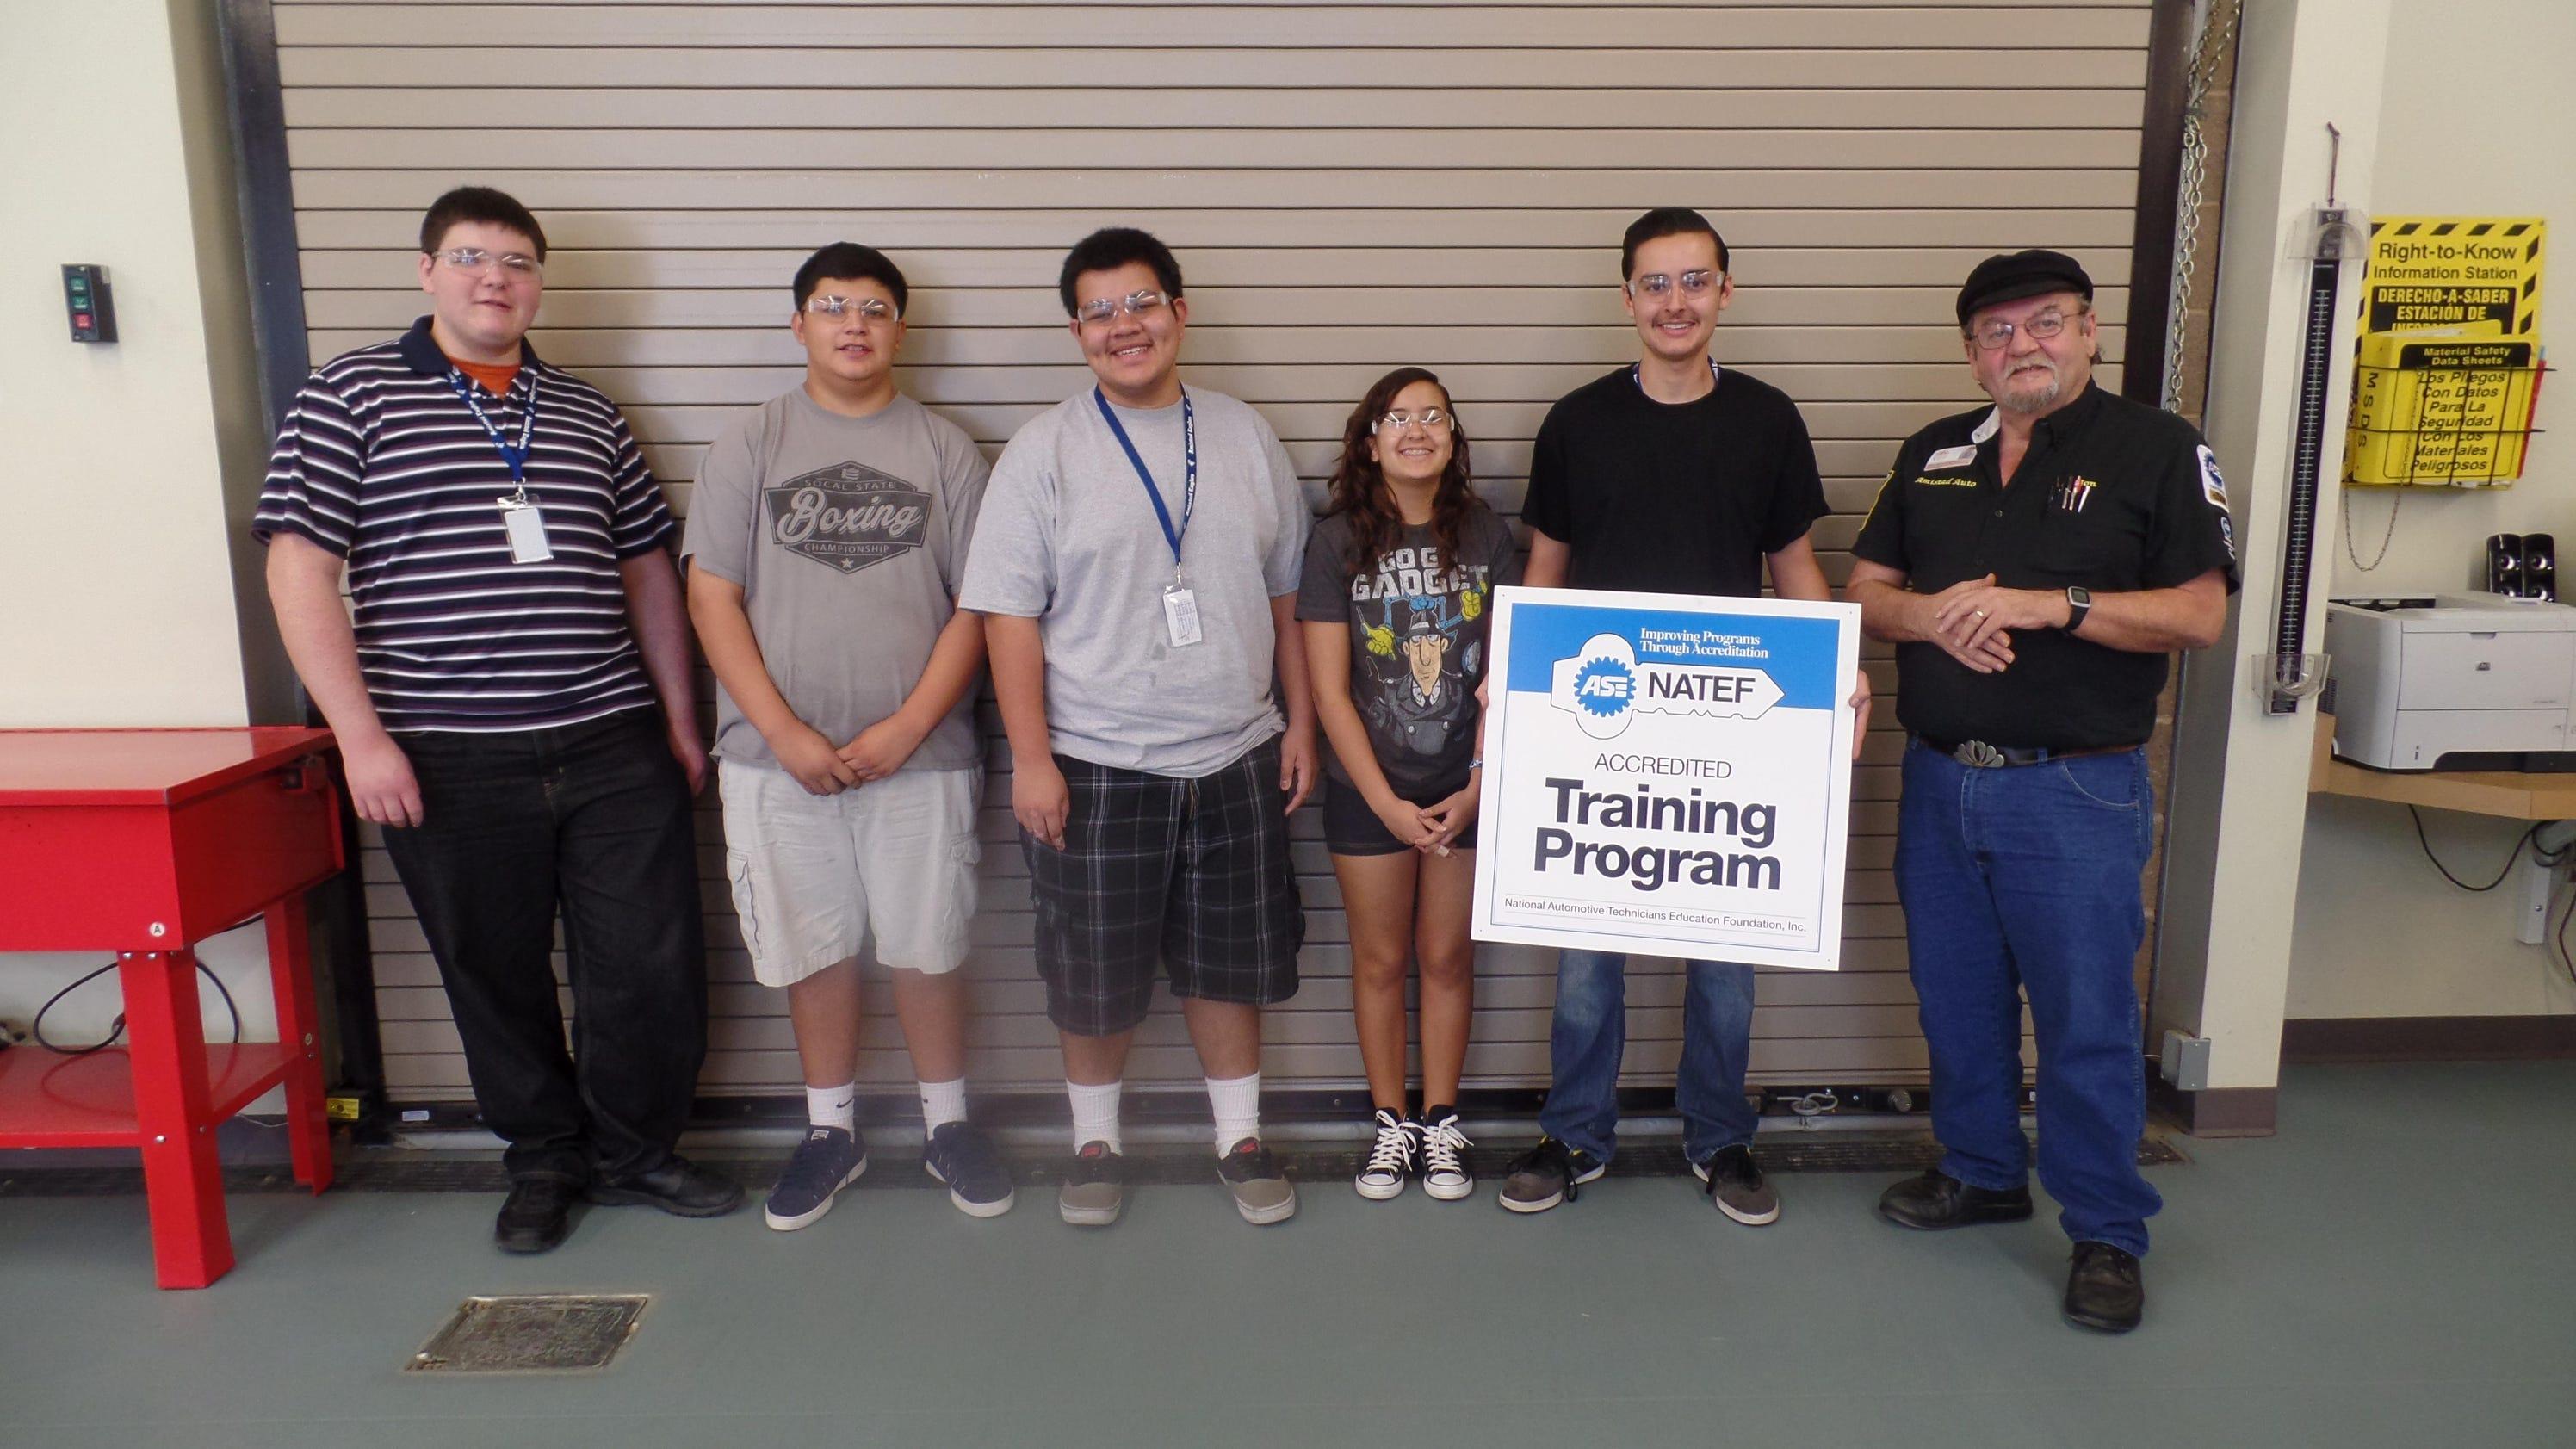 Amistad highs auto program earns accreditation xflitez Images